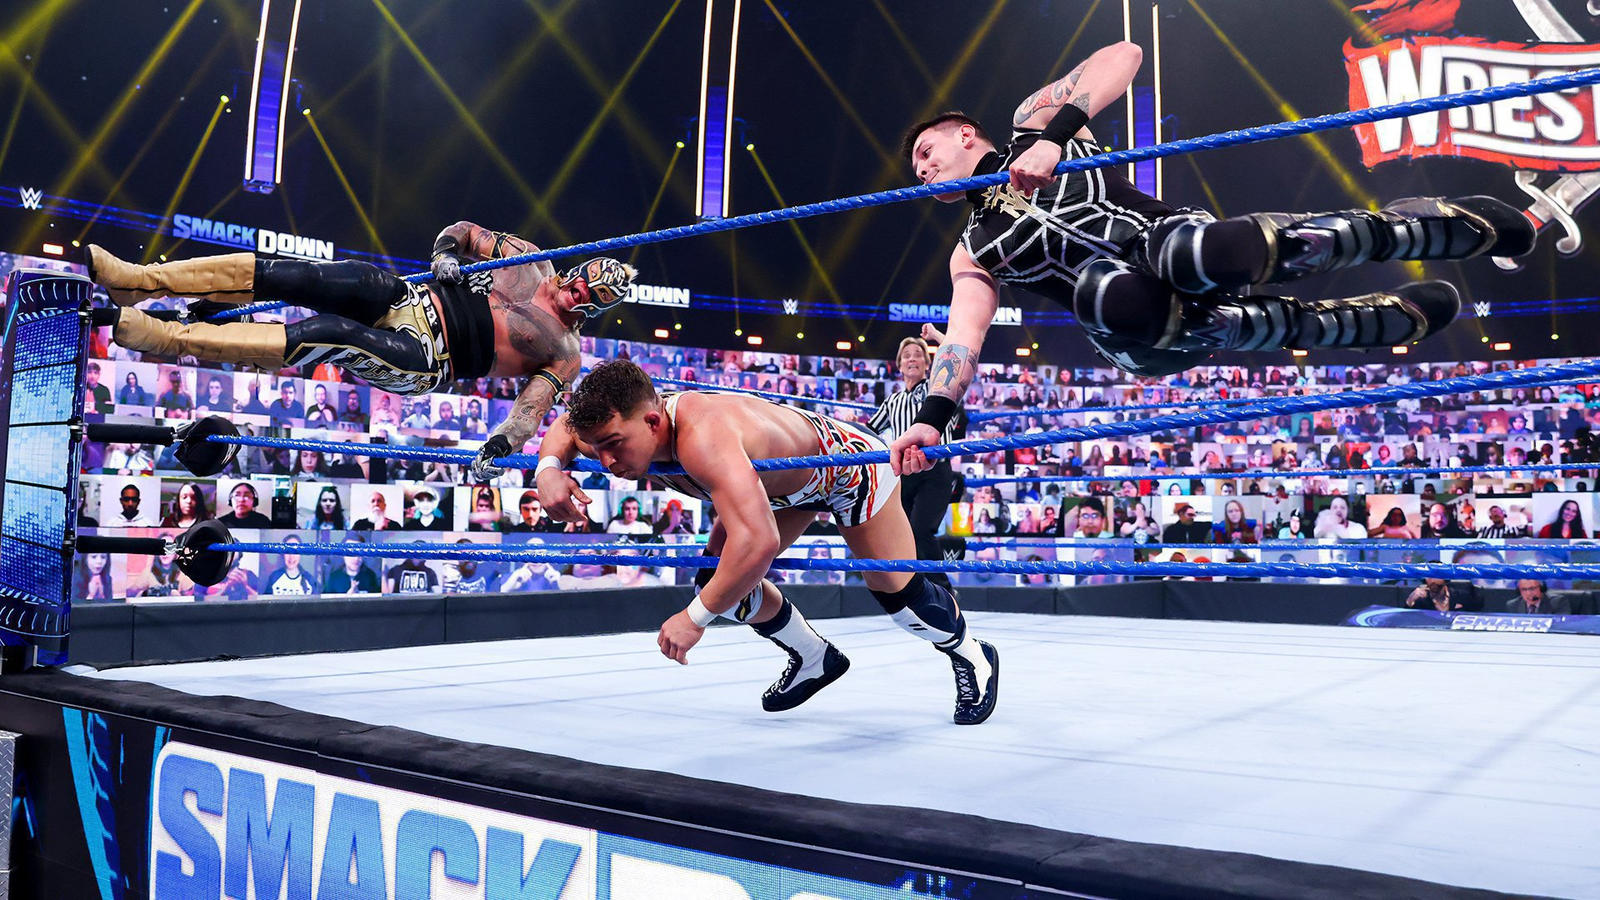 WWE Smackdown Results (26/02/21): Reigns Attacks Daniel Bryan; Wrestlemania announcement 2